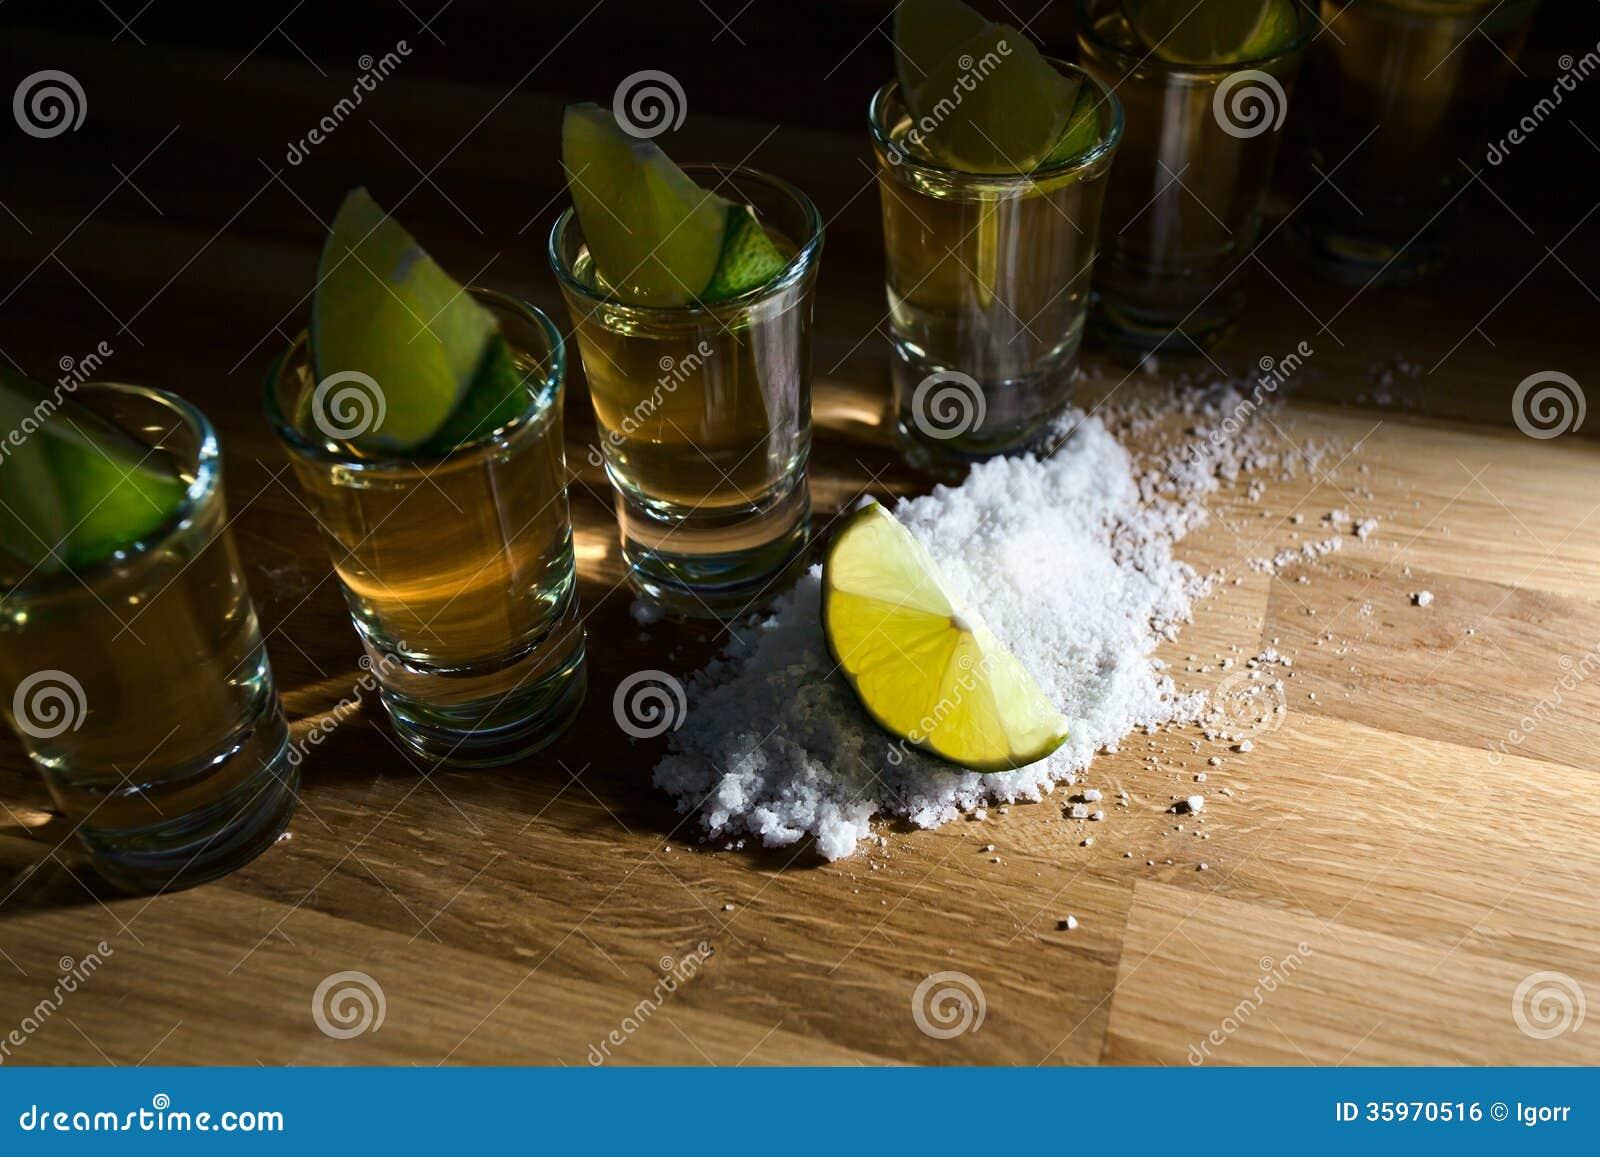 Tequila, cal y sal